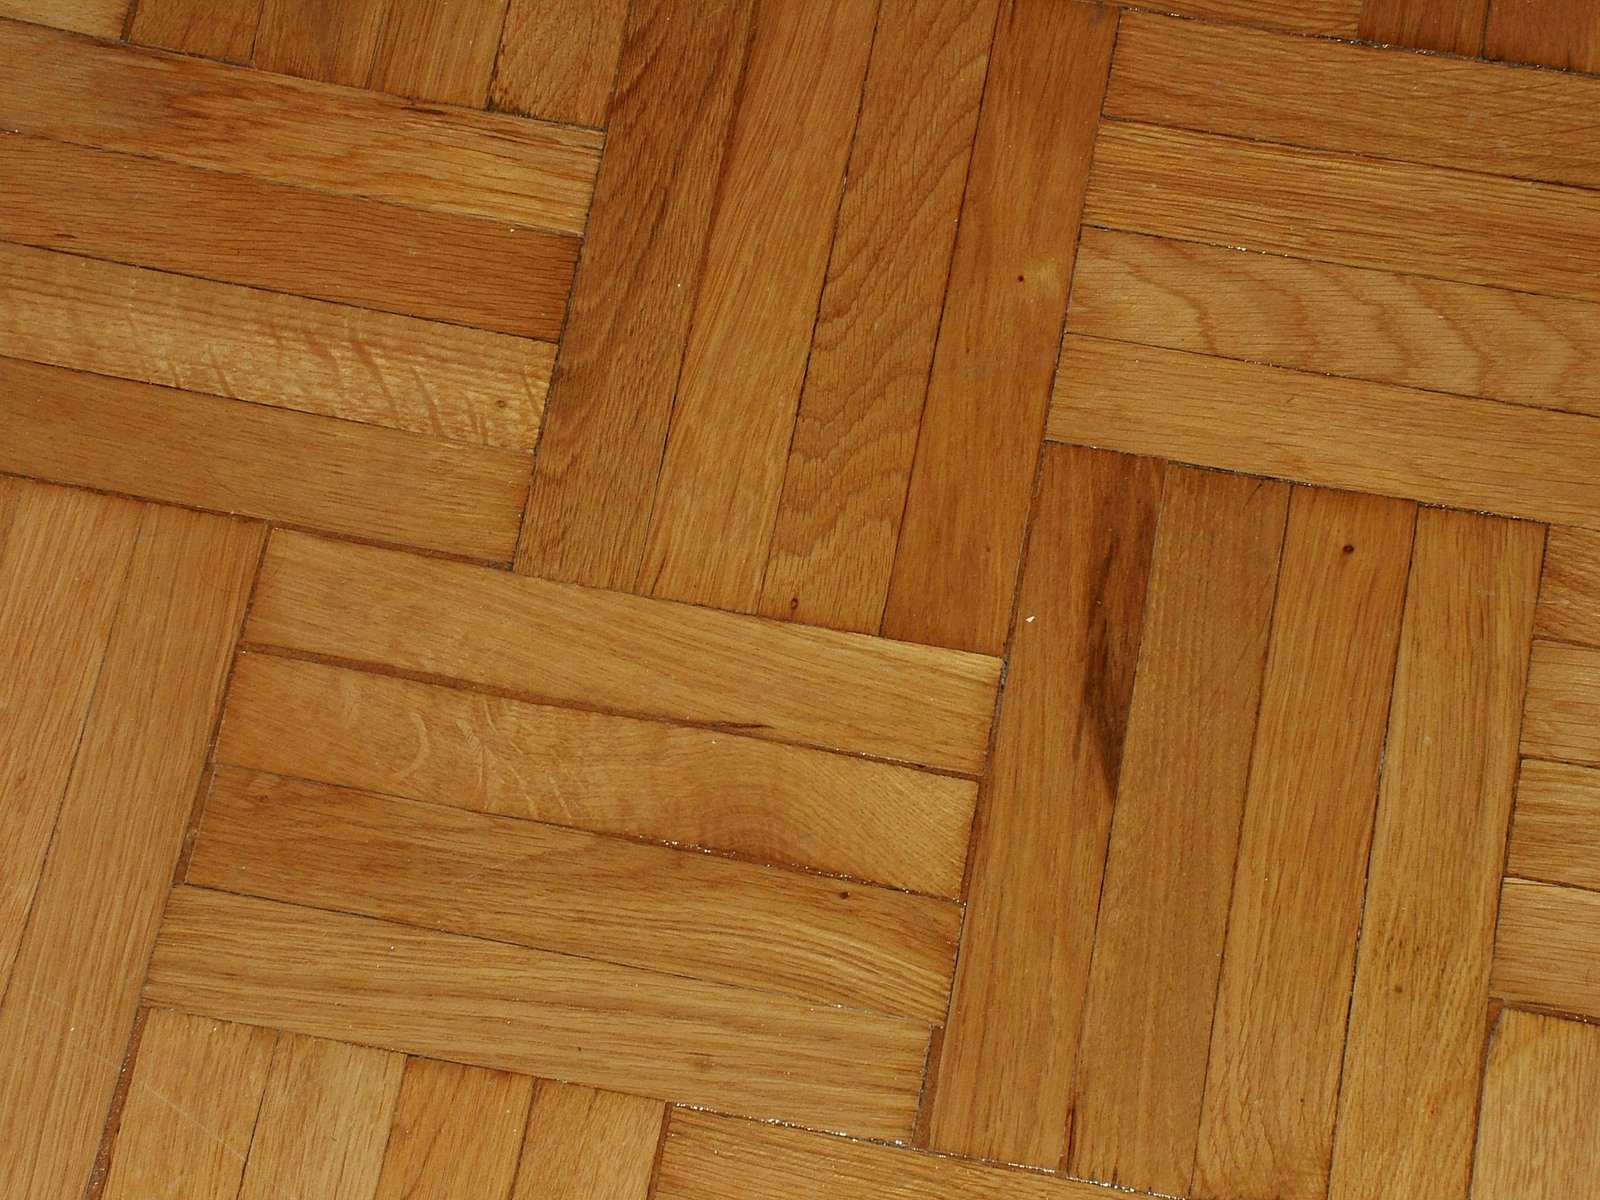 Free houten vloer textuur stock photo freeimages.com